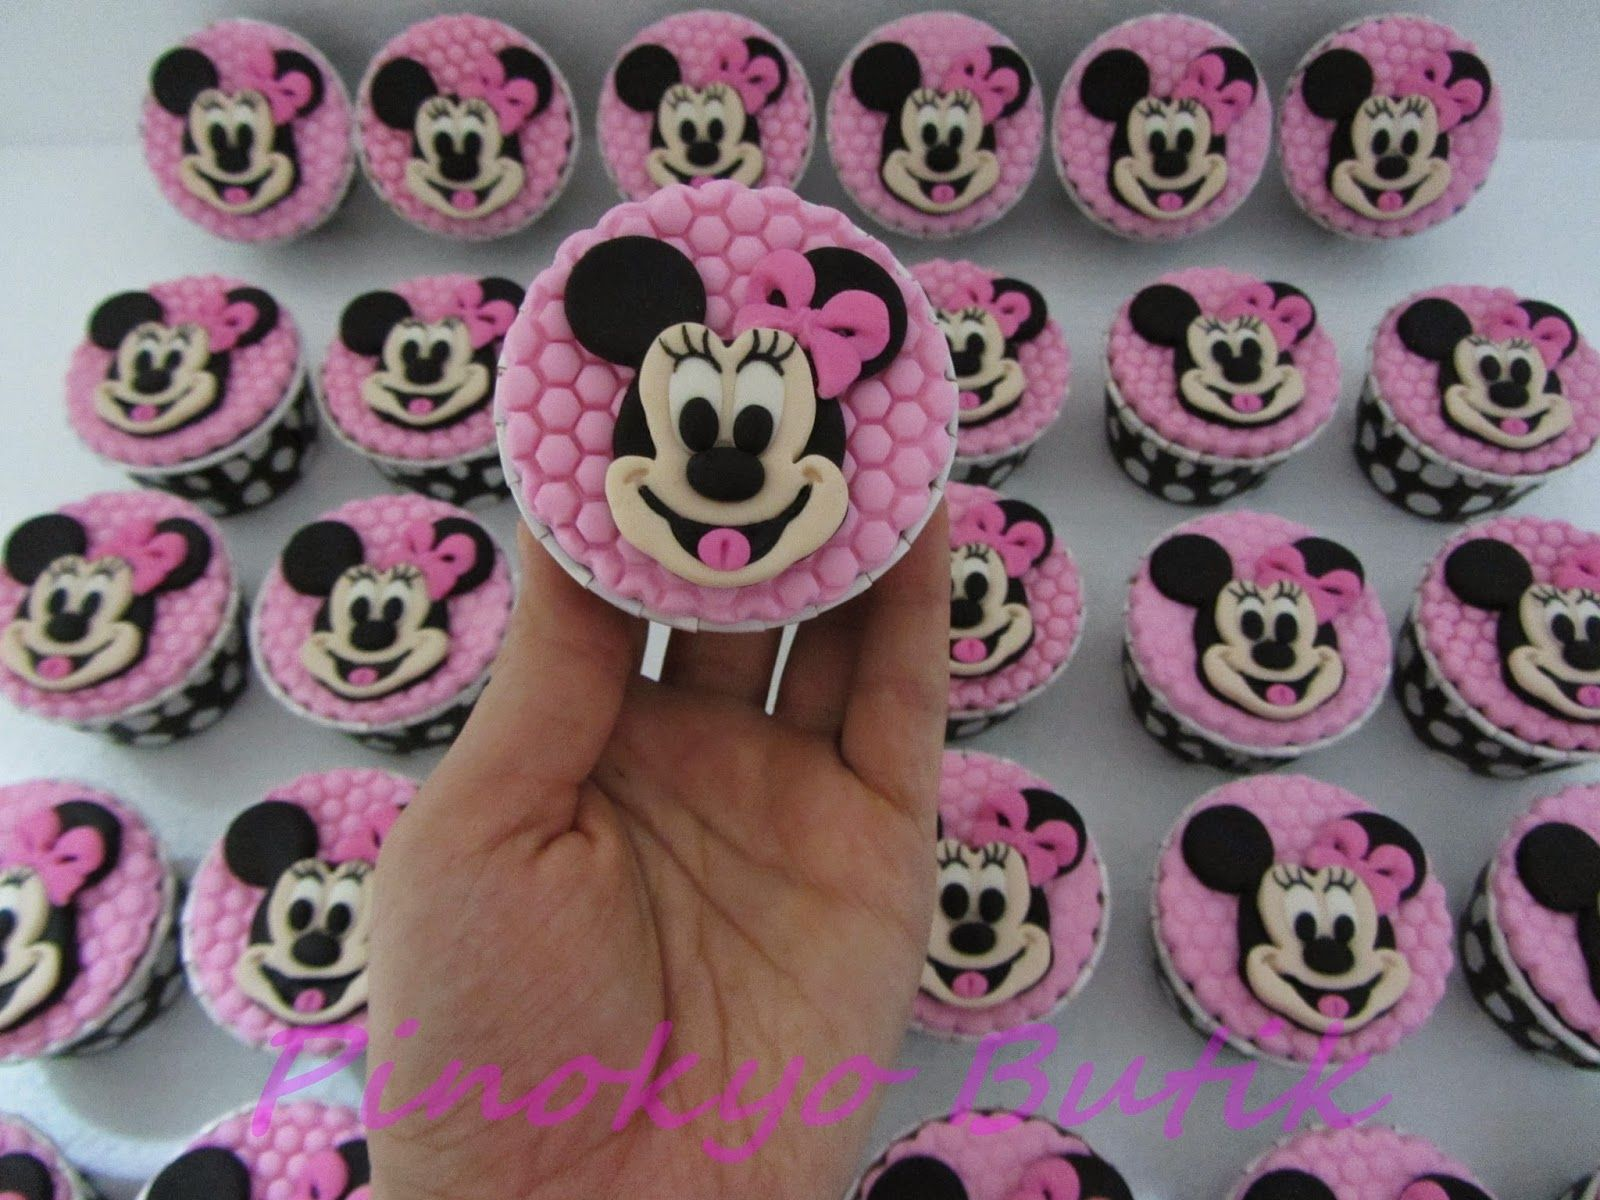 Pinokyo Butik Kurabiye ve Pasta - İzmit: Minnie Mouse temalı cupcake ve kurabiyeler